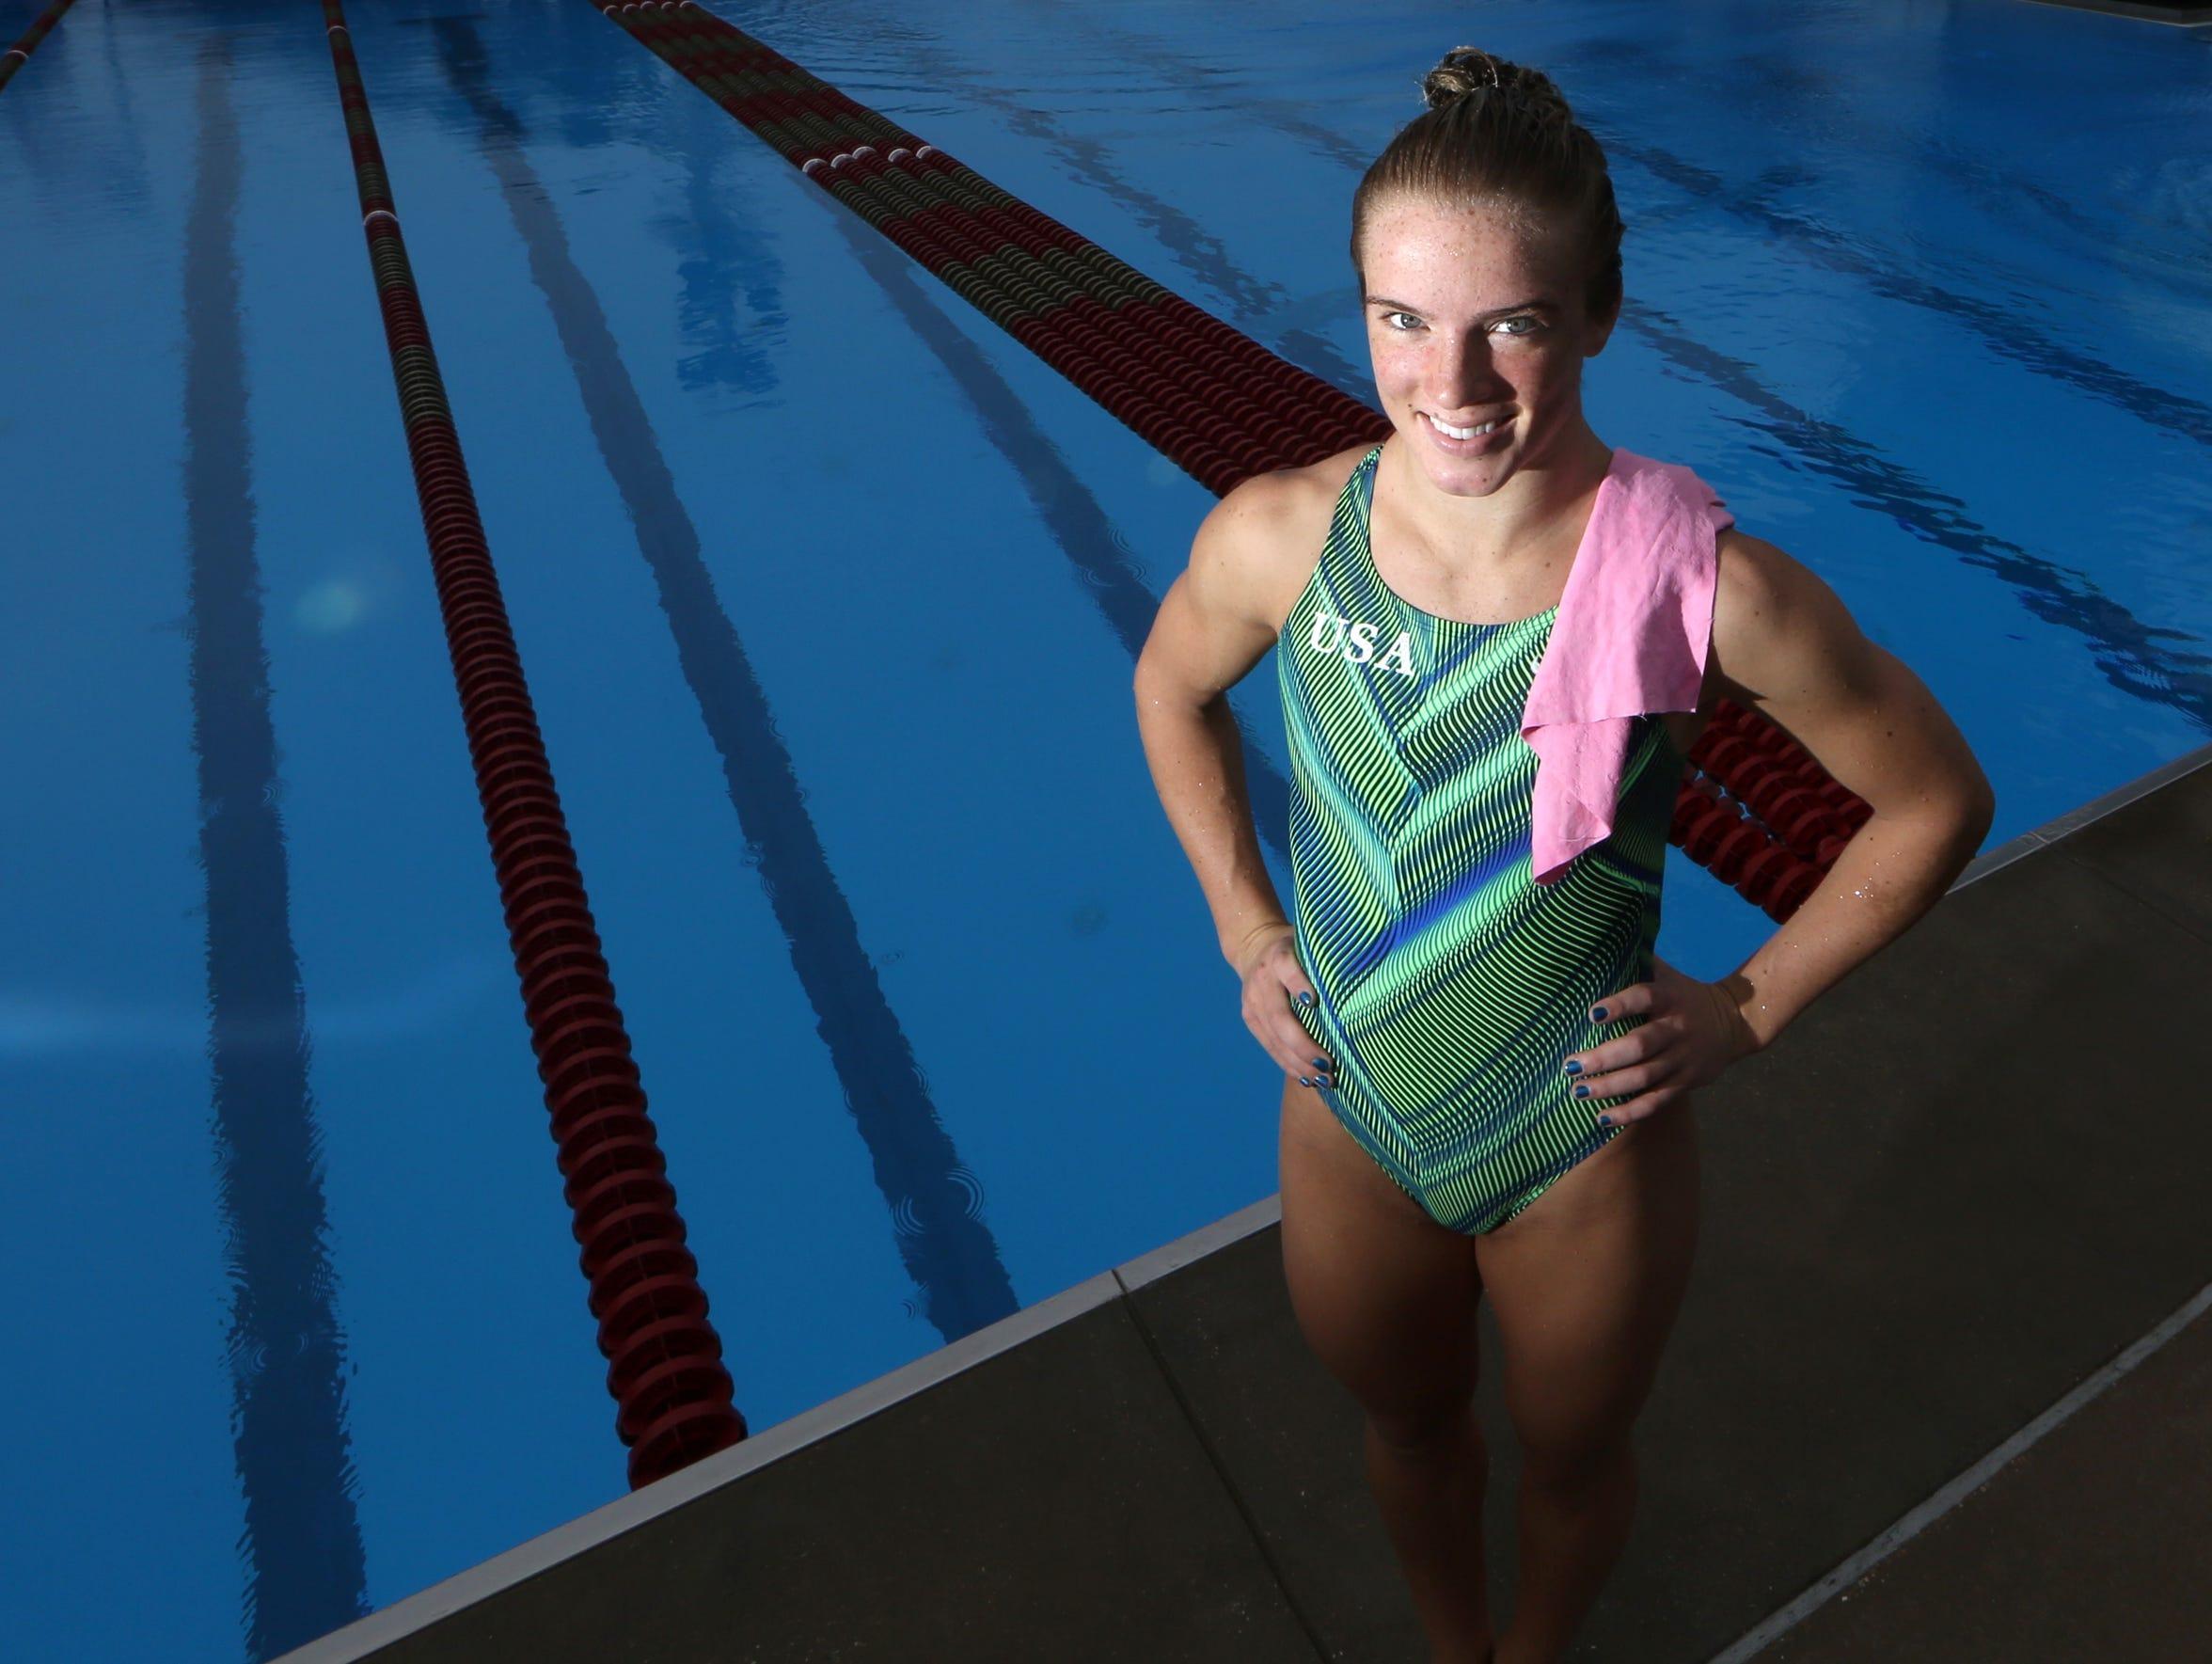 Former FSU diver Katrina Young has qualified to represent